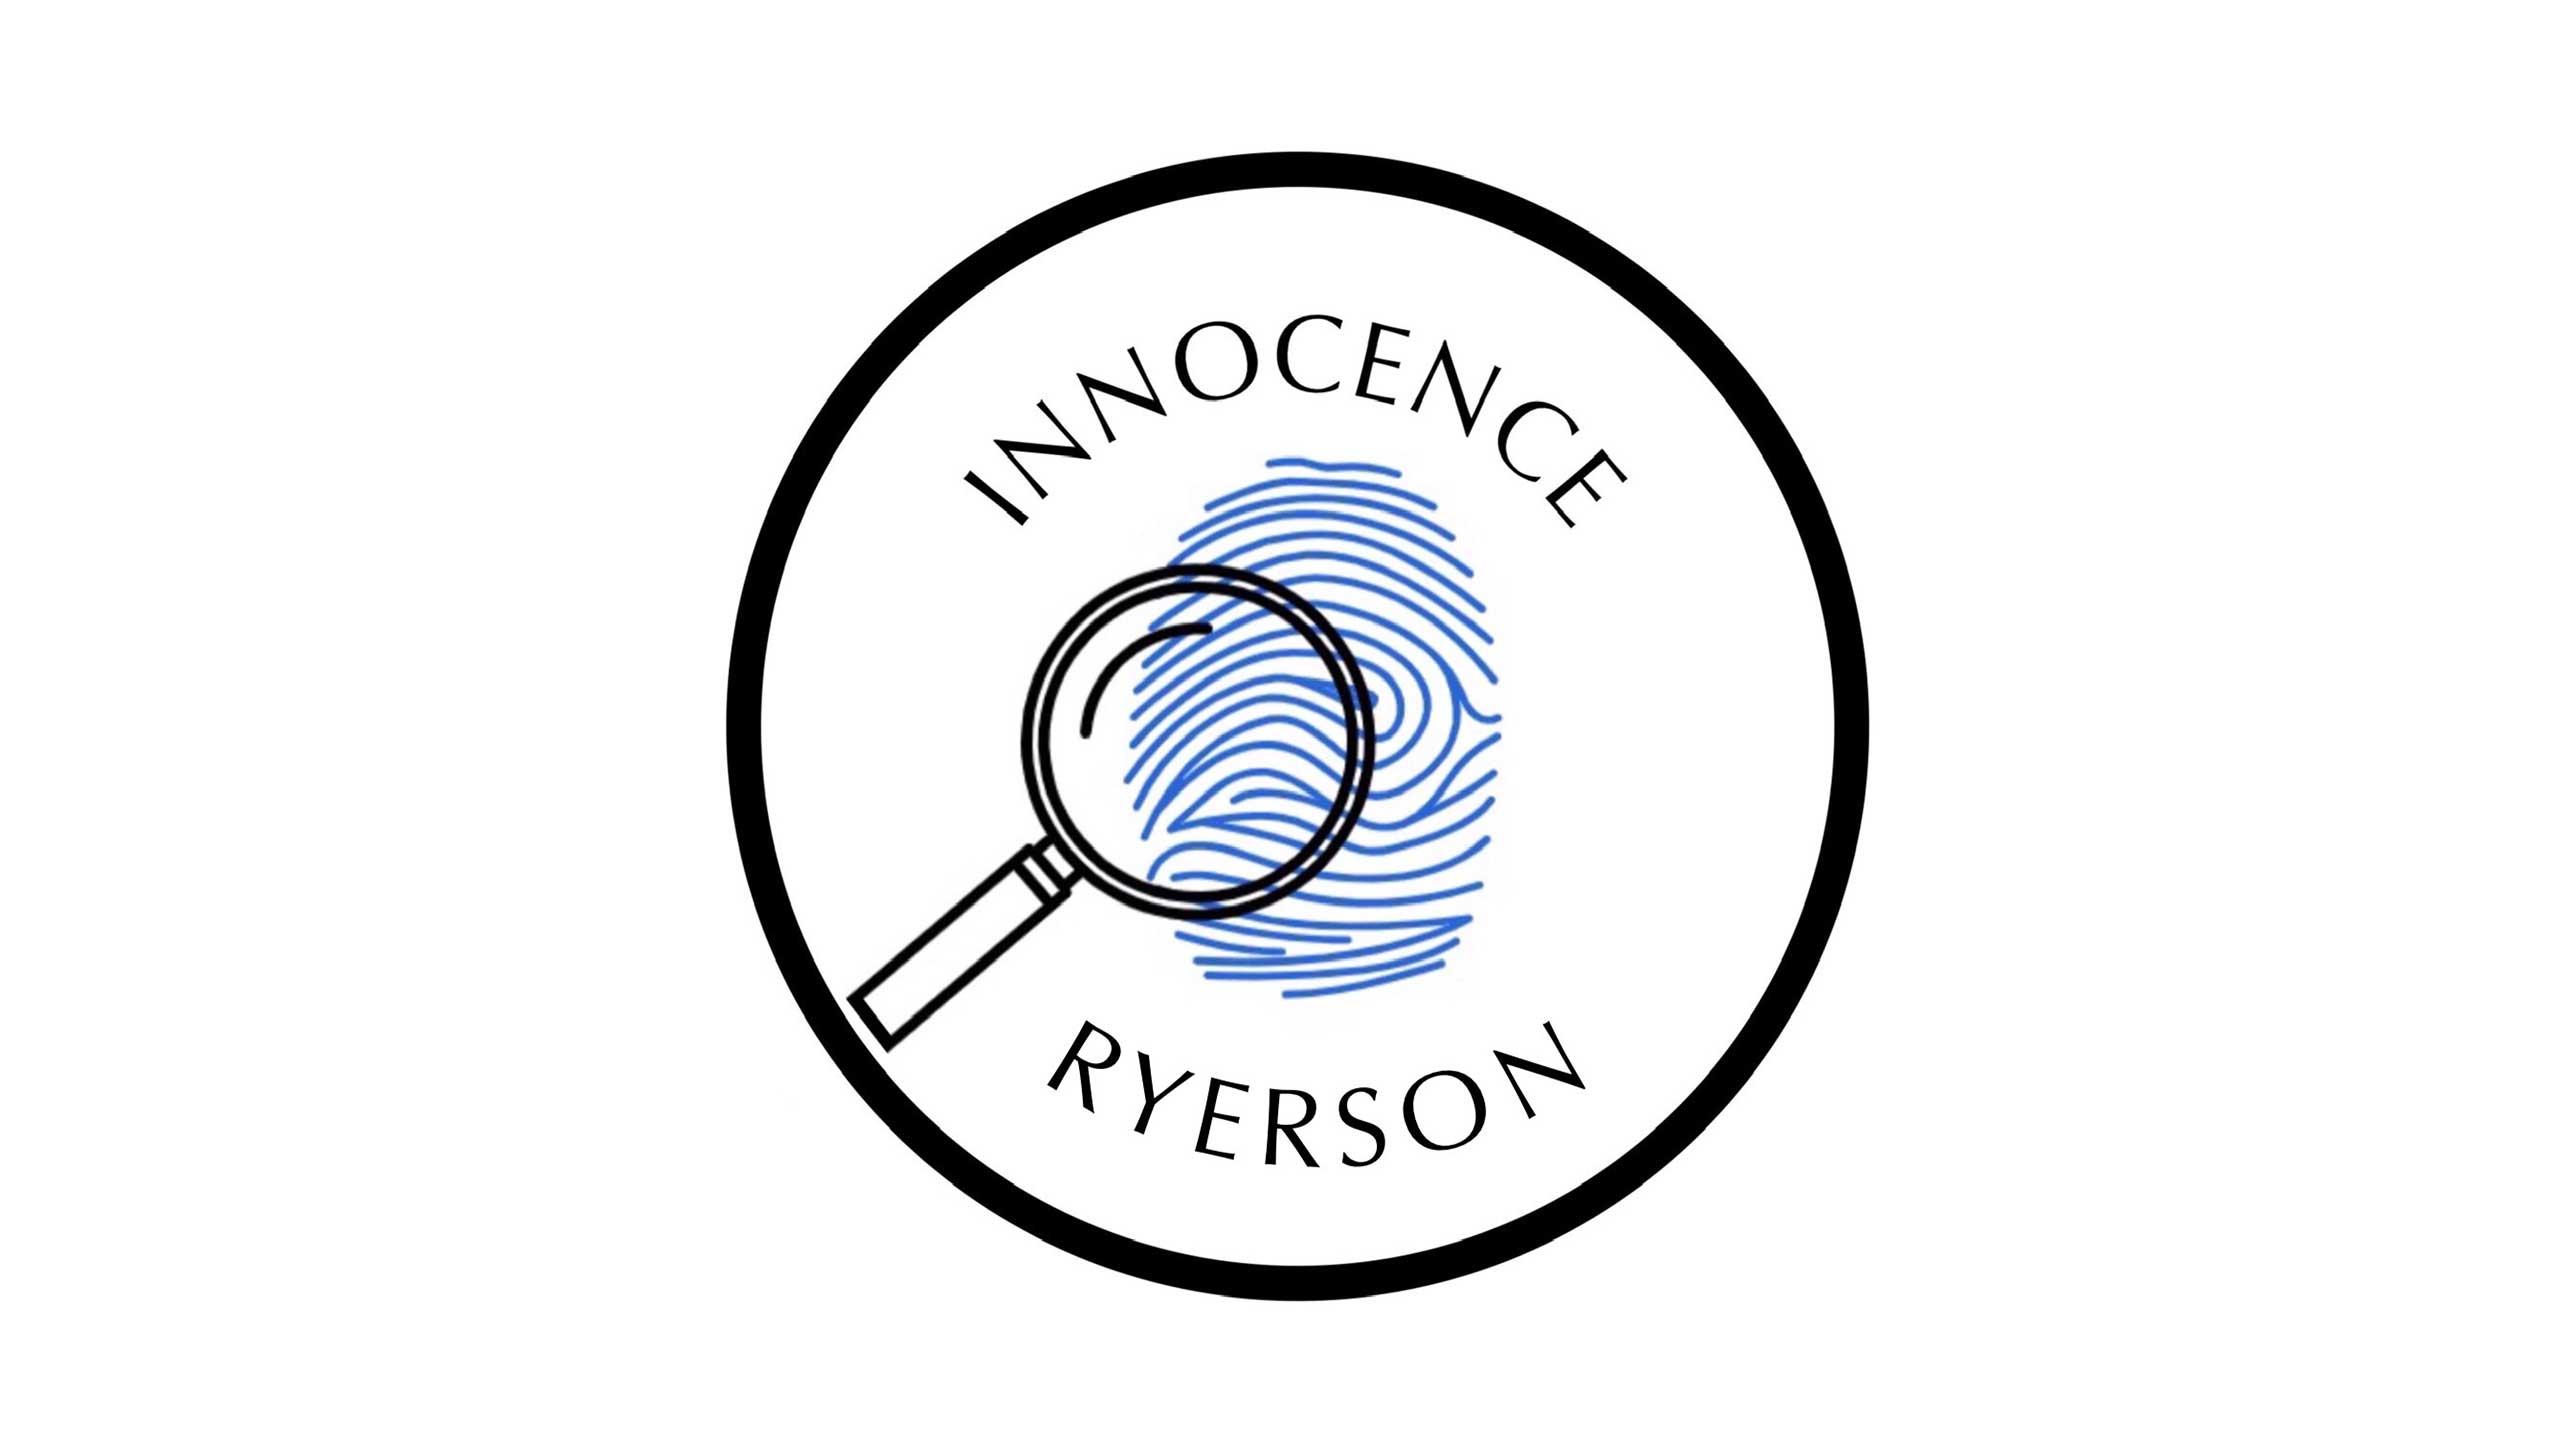 The Logo of Innocence Ryerson